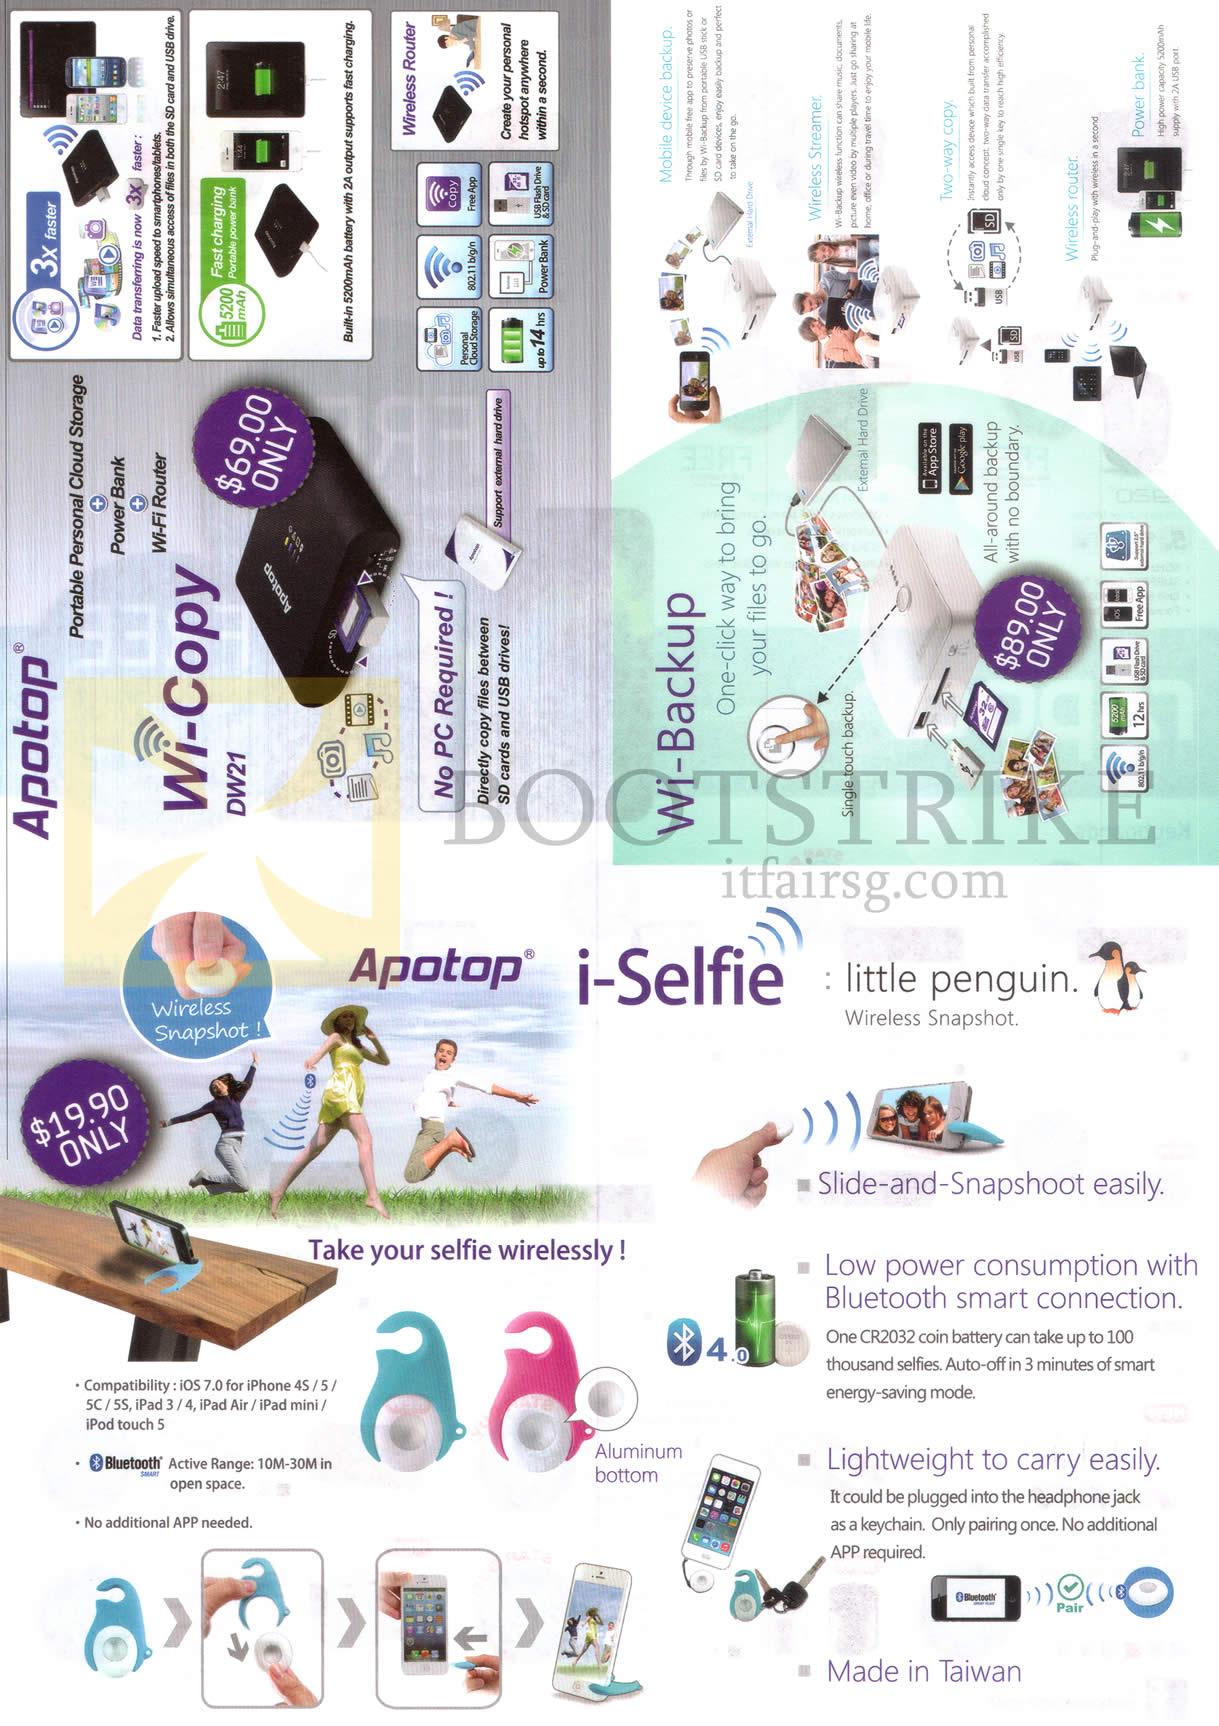 PC SHOW 2014 price list image brochure of Apotop Wi Copy DW21, Wi-Backup, I-Selfie